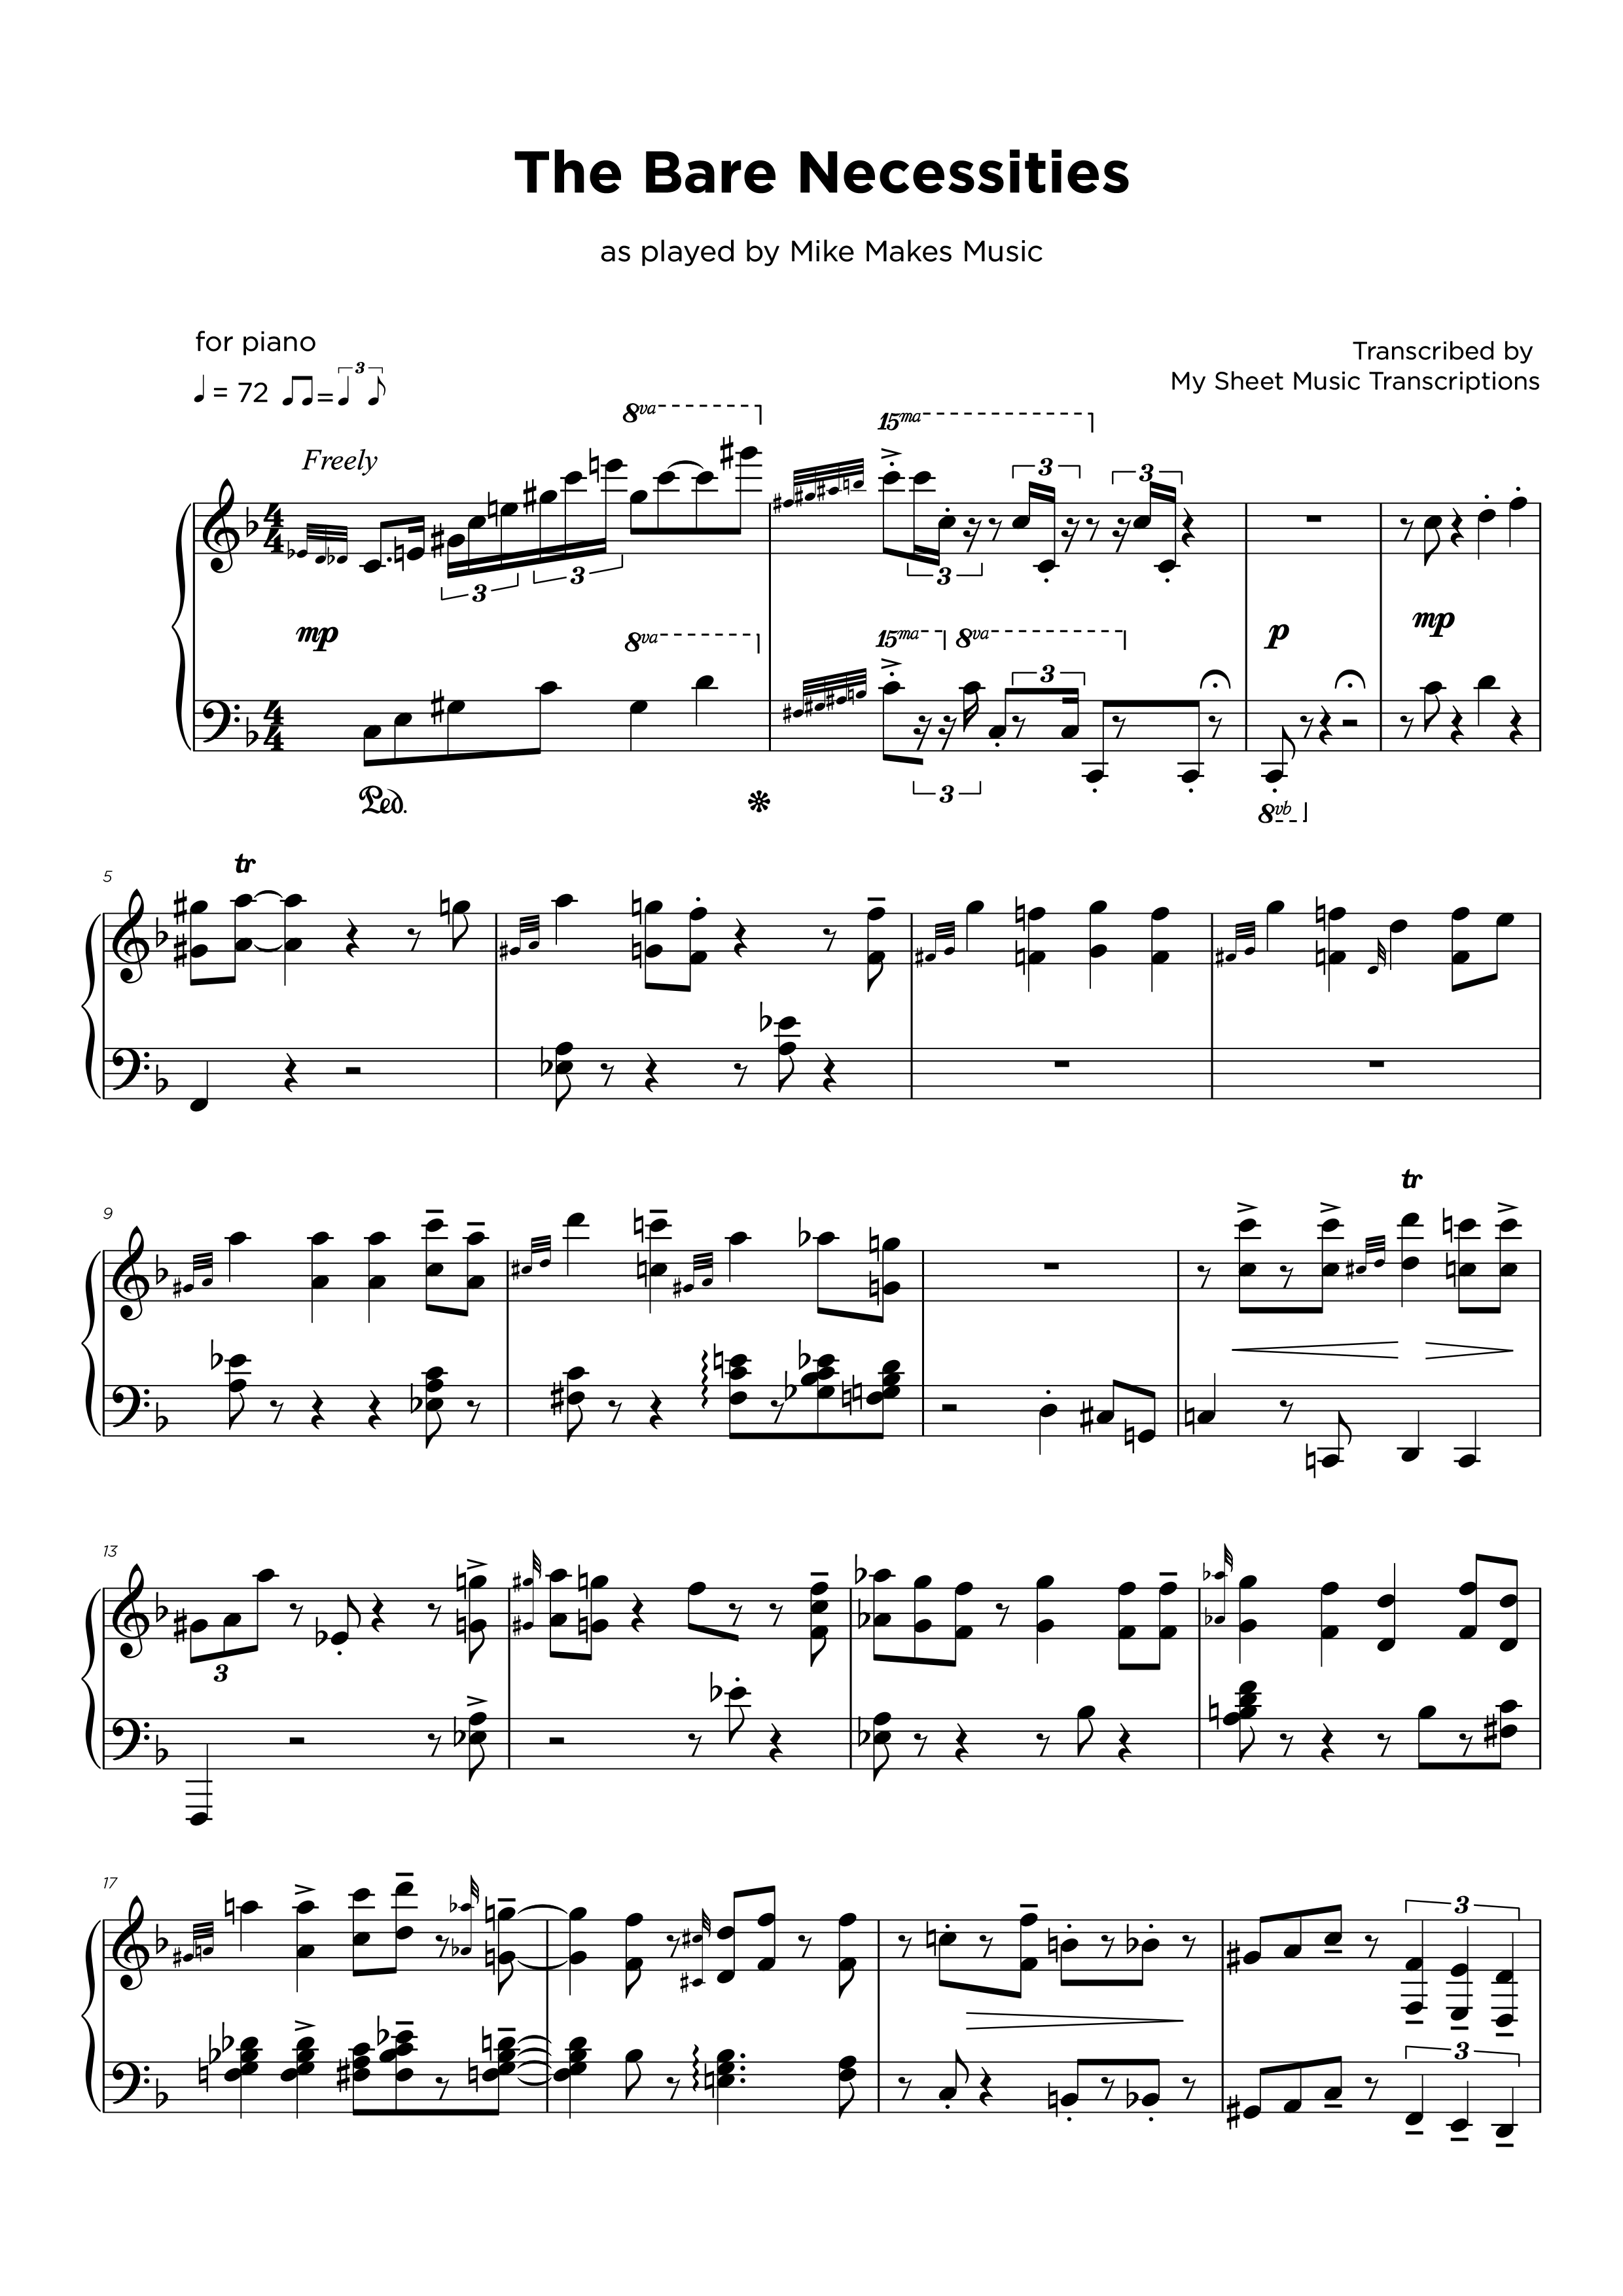 - Transcripción de partitura para piano jazz